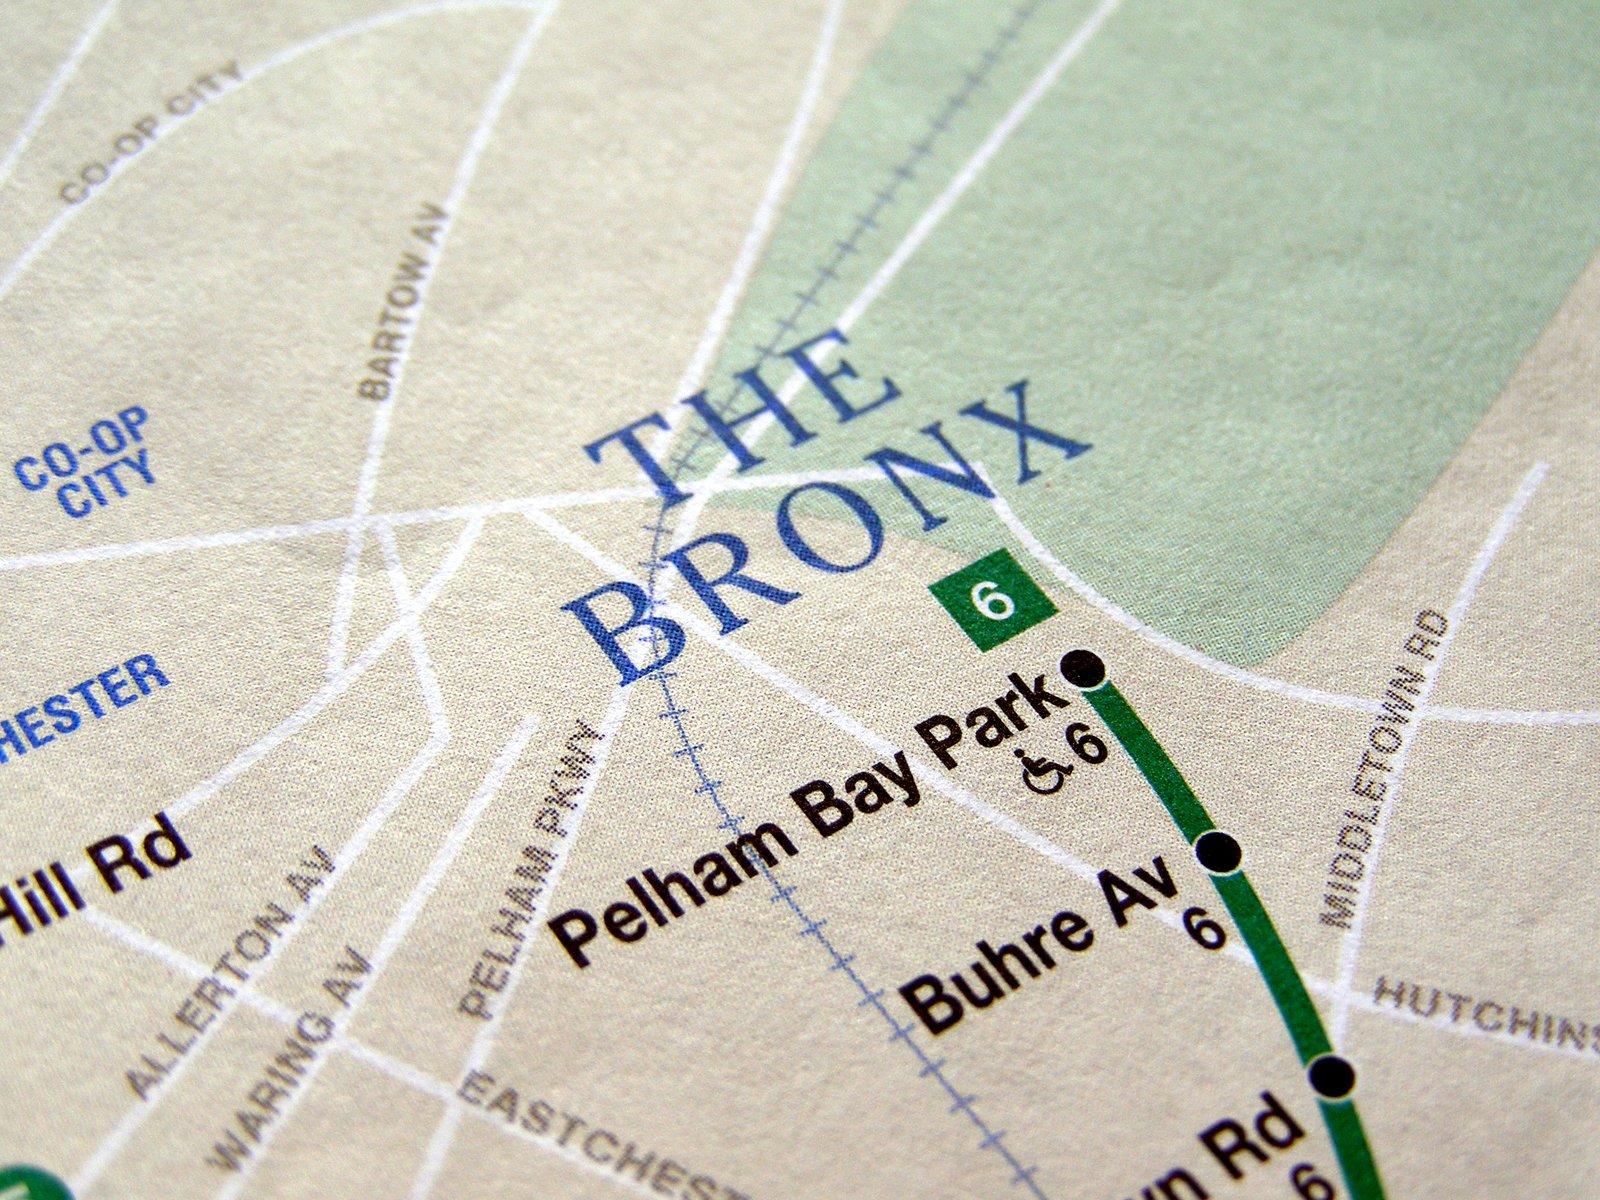 West Farms Bronx, NY Private Investigator